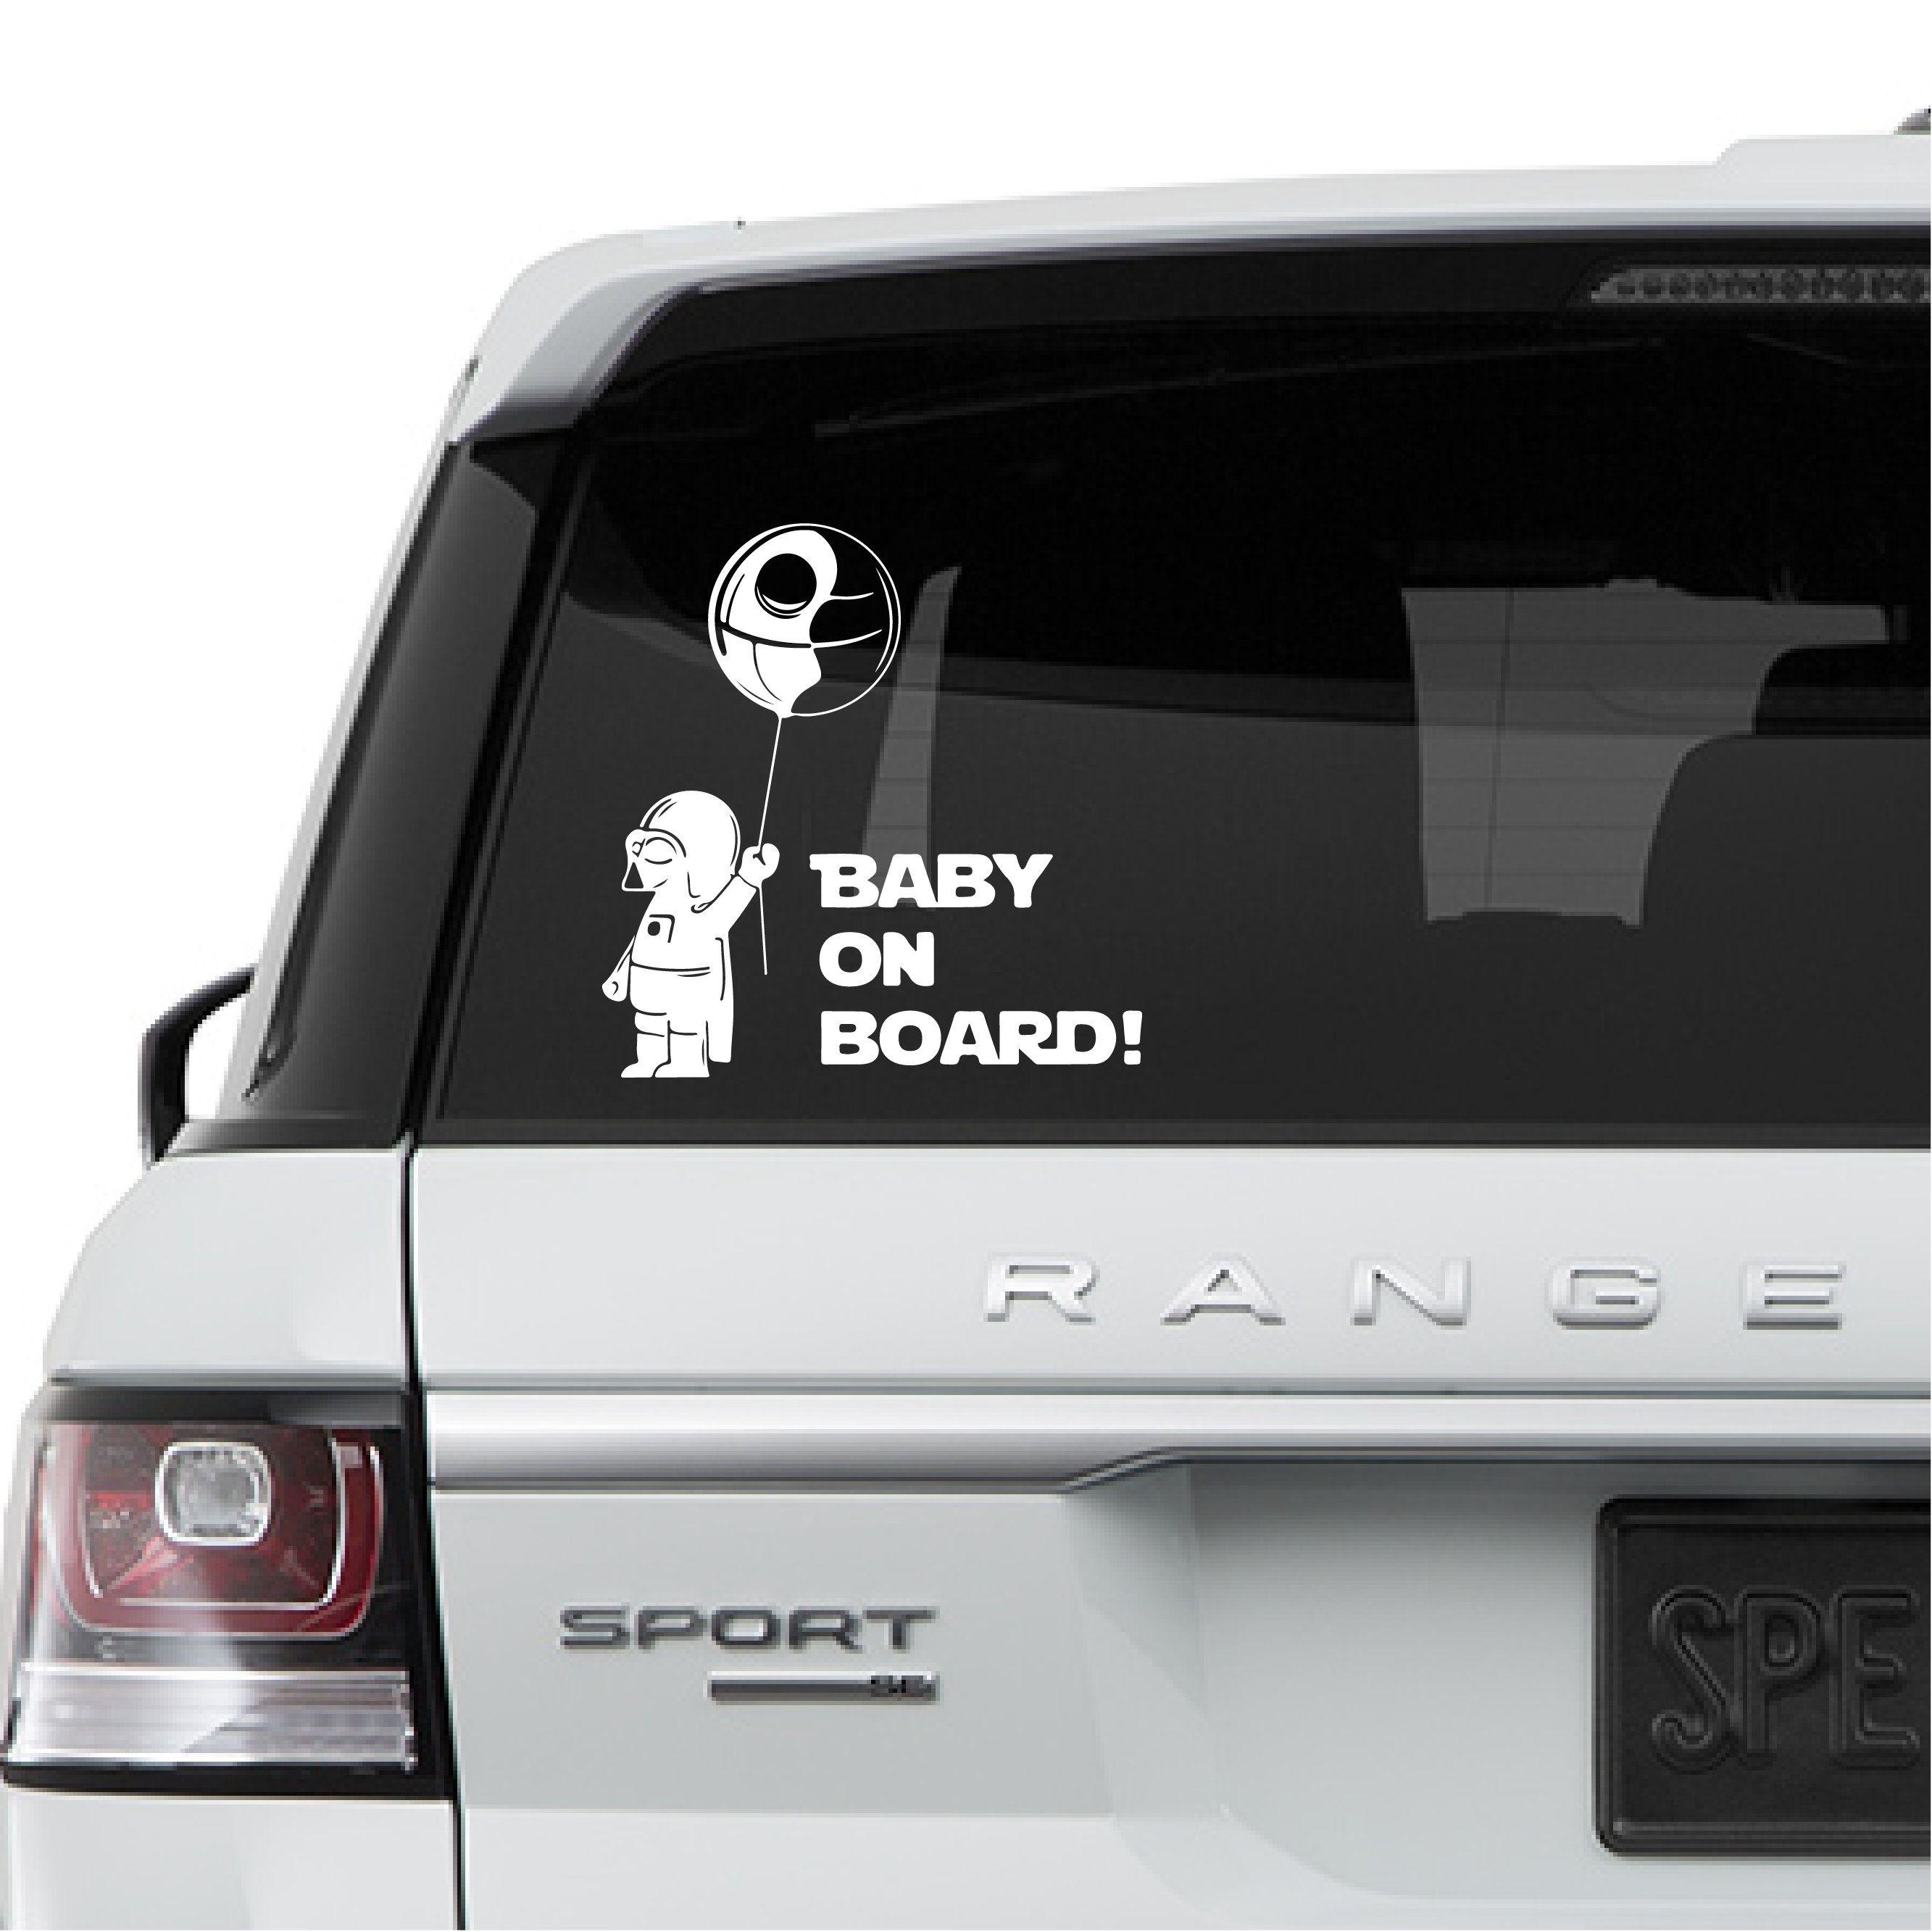 Darth Vader Baby On Board Star Wars Car Vinyl Decal Sticker Star Wars Laptop Wall Childrens Wall Decals Car Decals Vinyl Baby Decals [ 2666 x 2666 Pixel ]